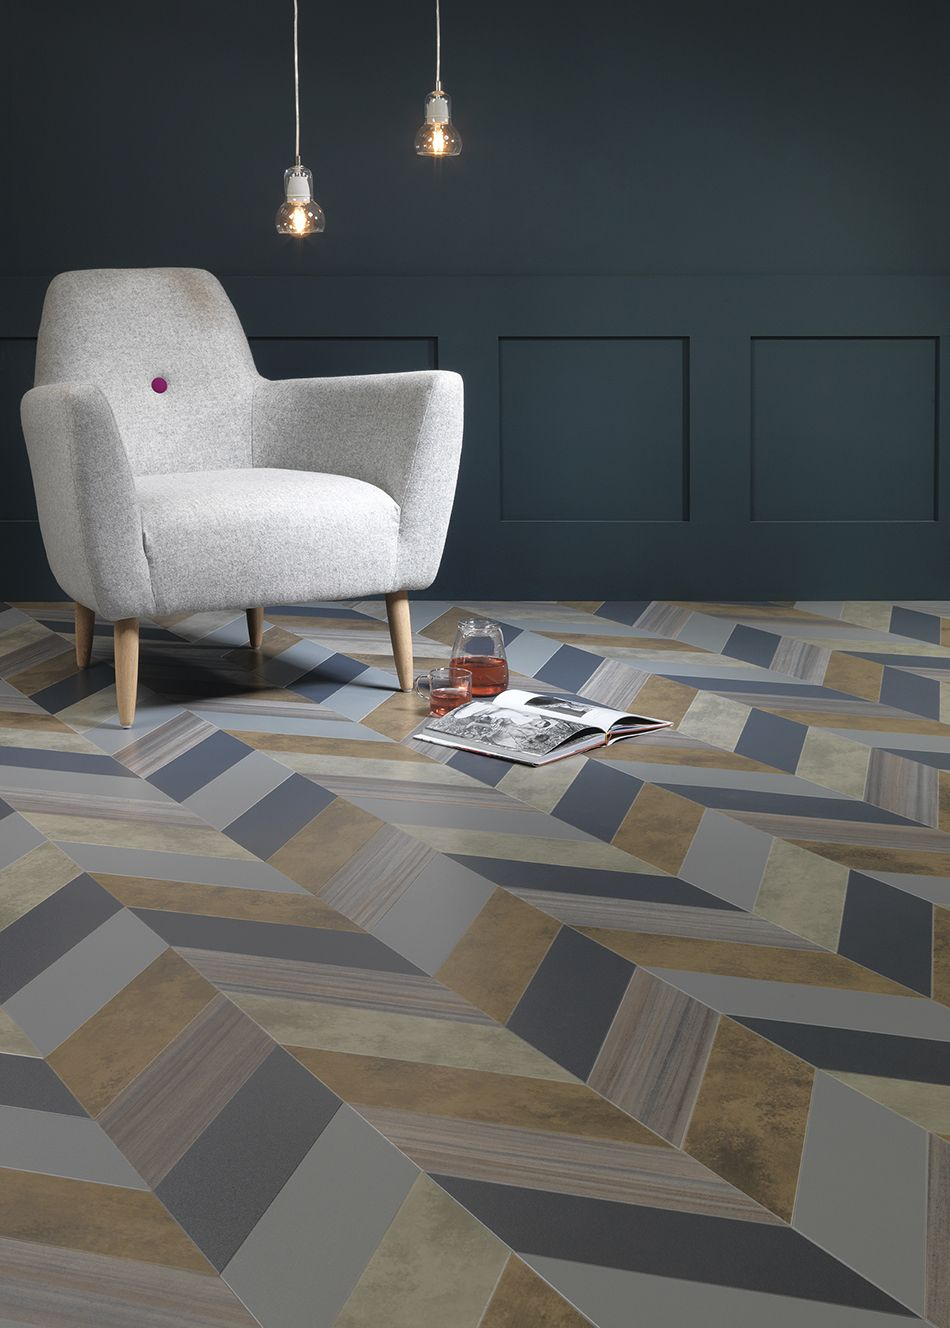 Make unique vinyl flooring patterns from www.michael-john.co.uk ...